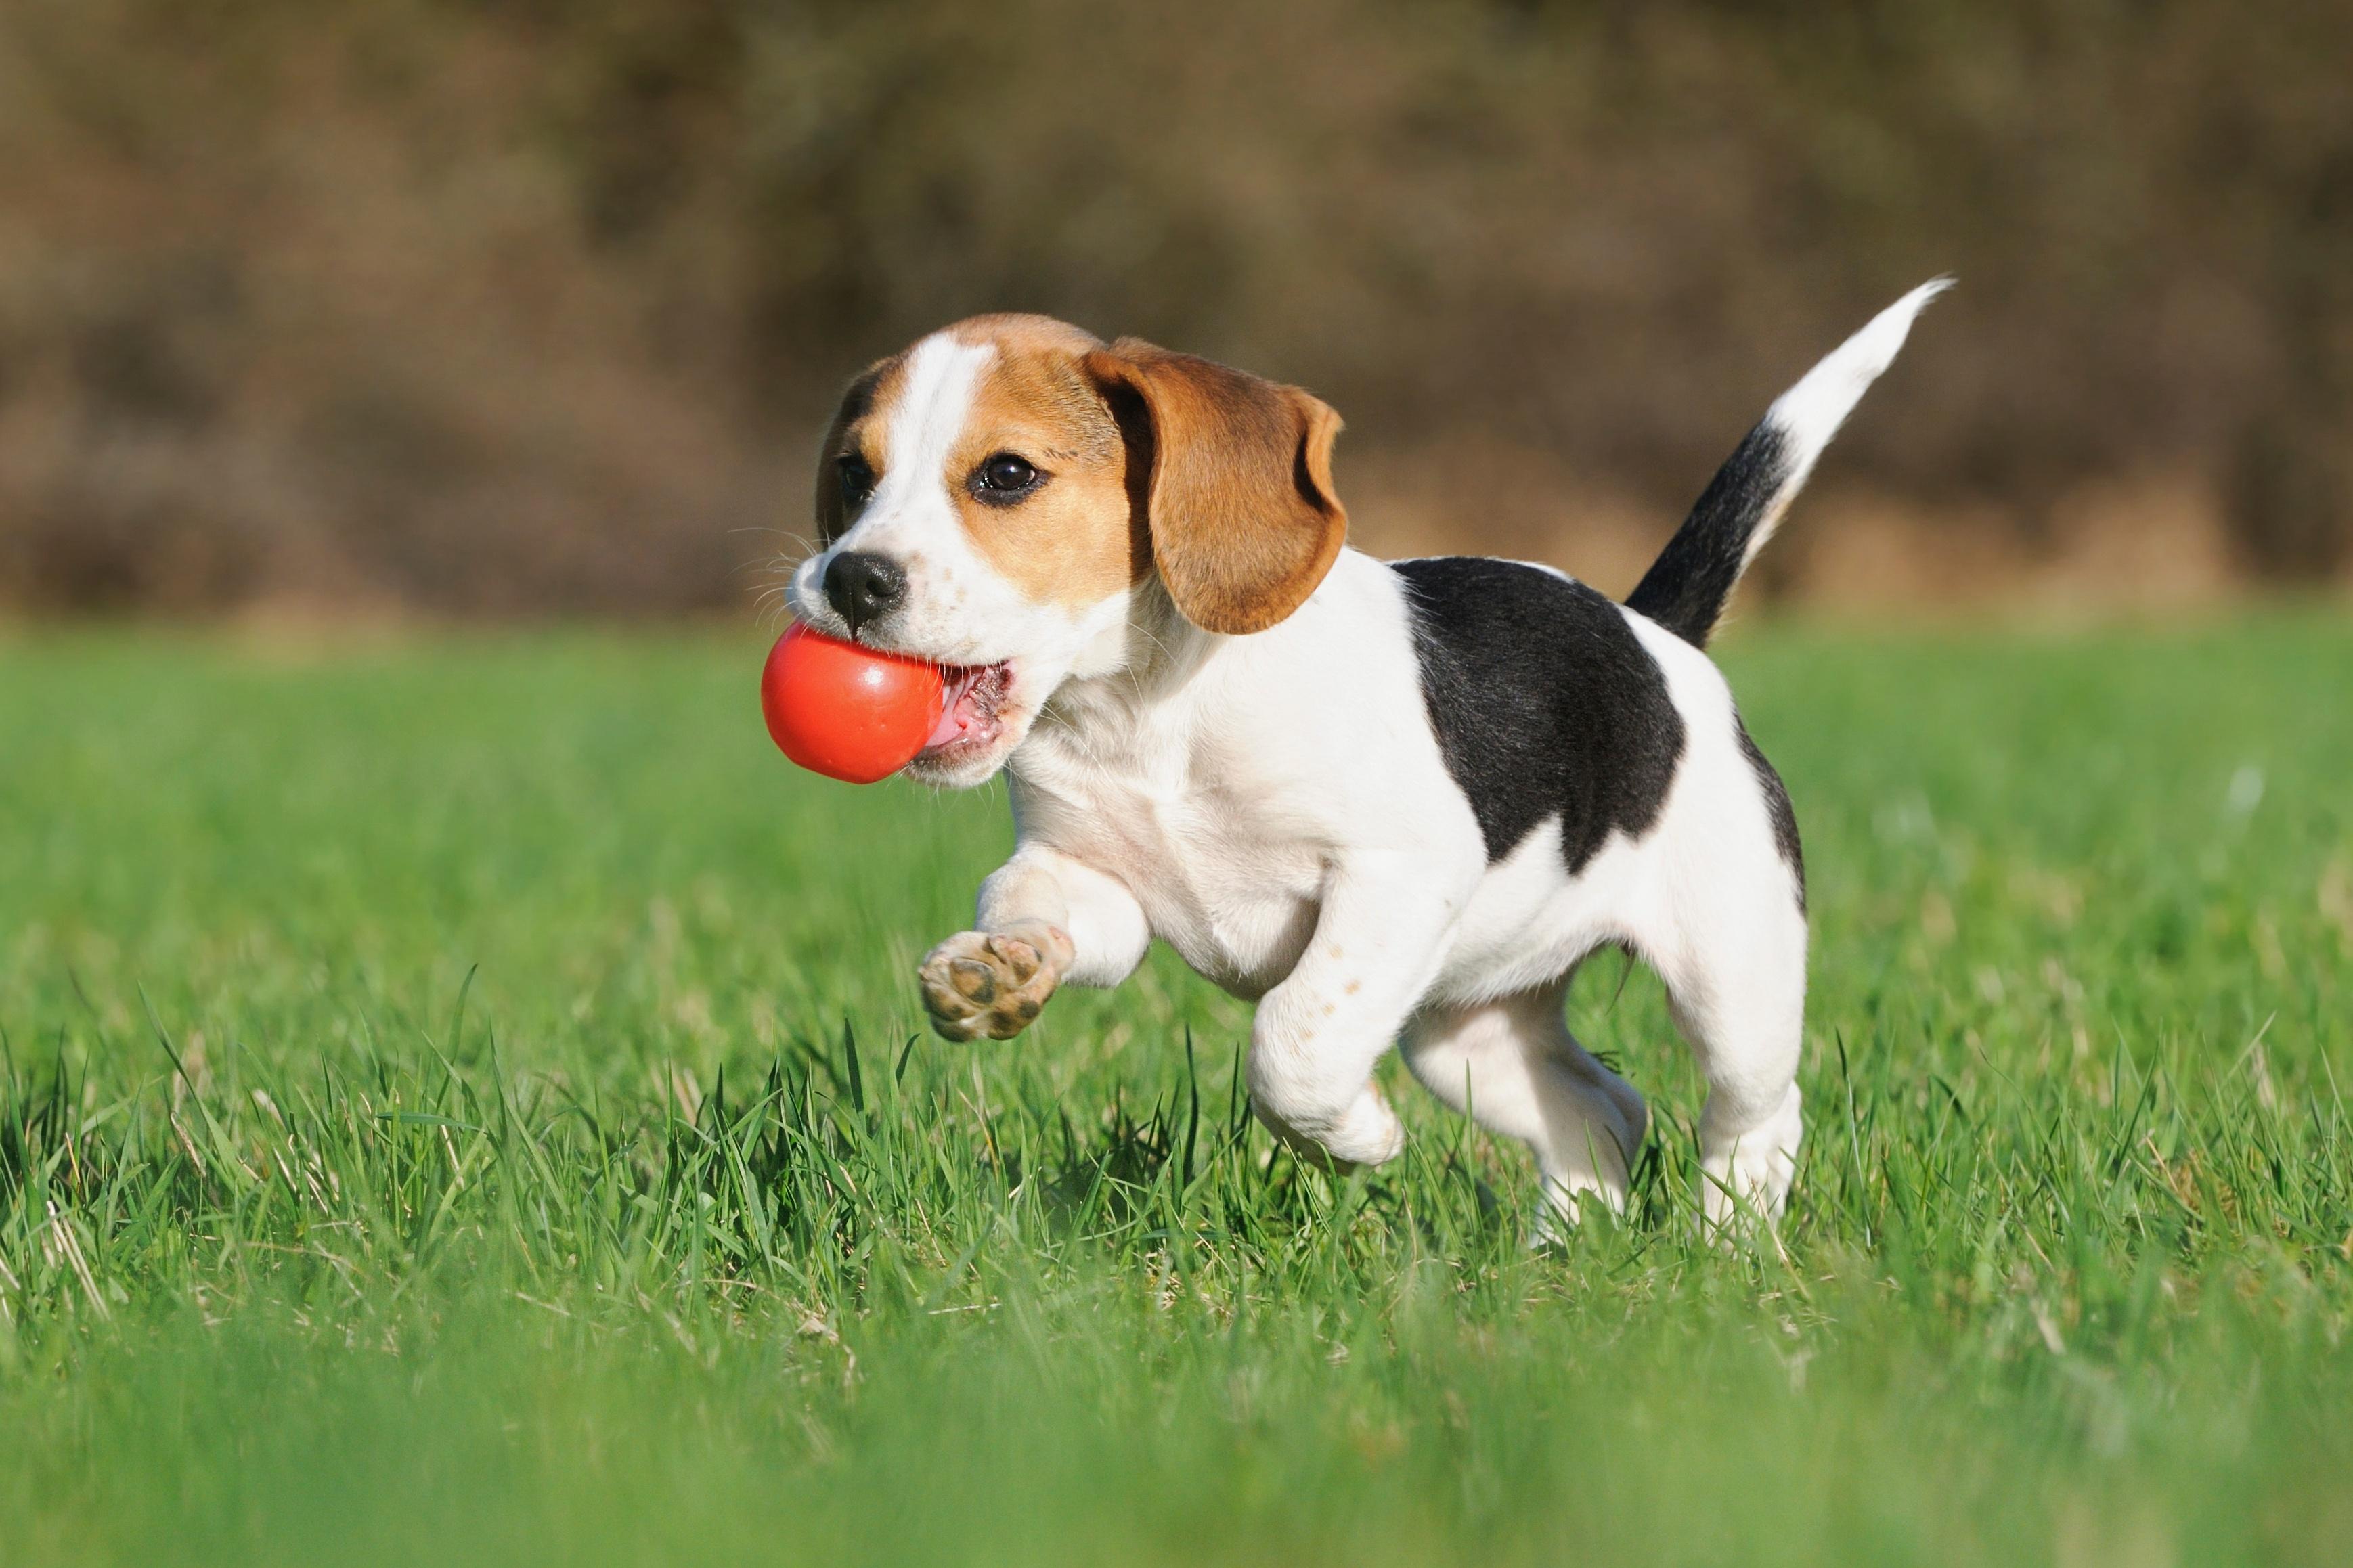 Beagle_playing_with_ball_on_organic_lawn.jpg